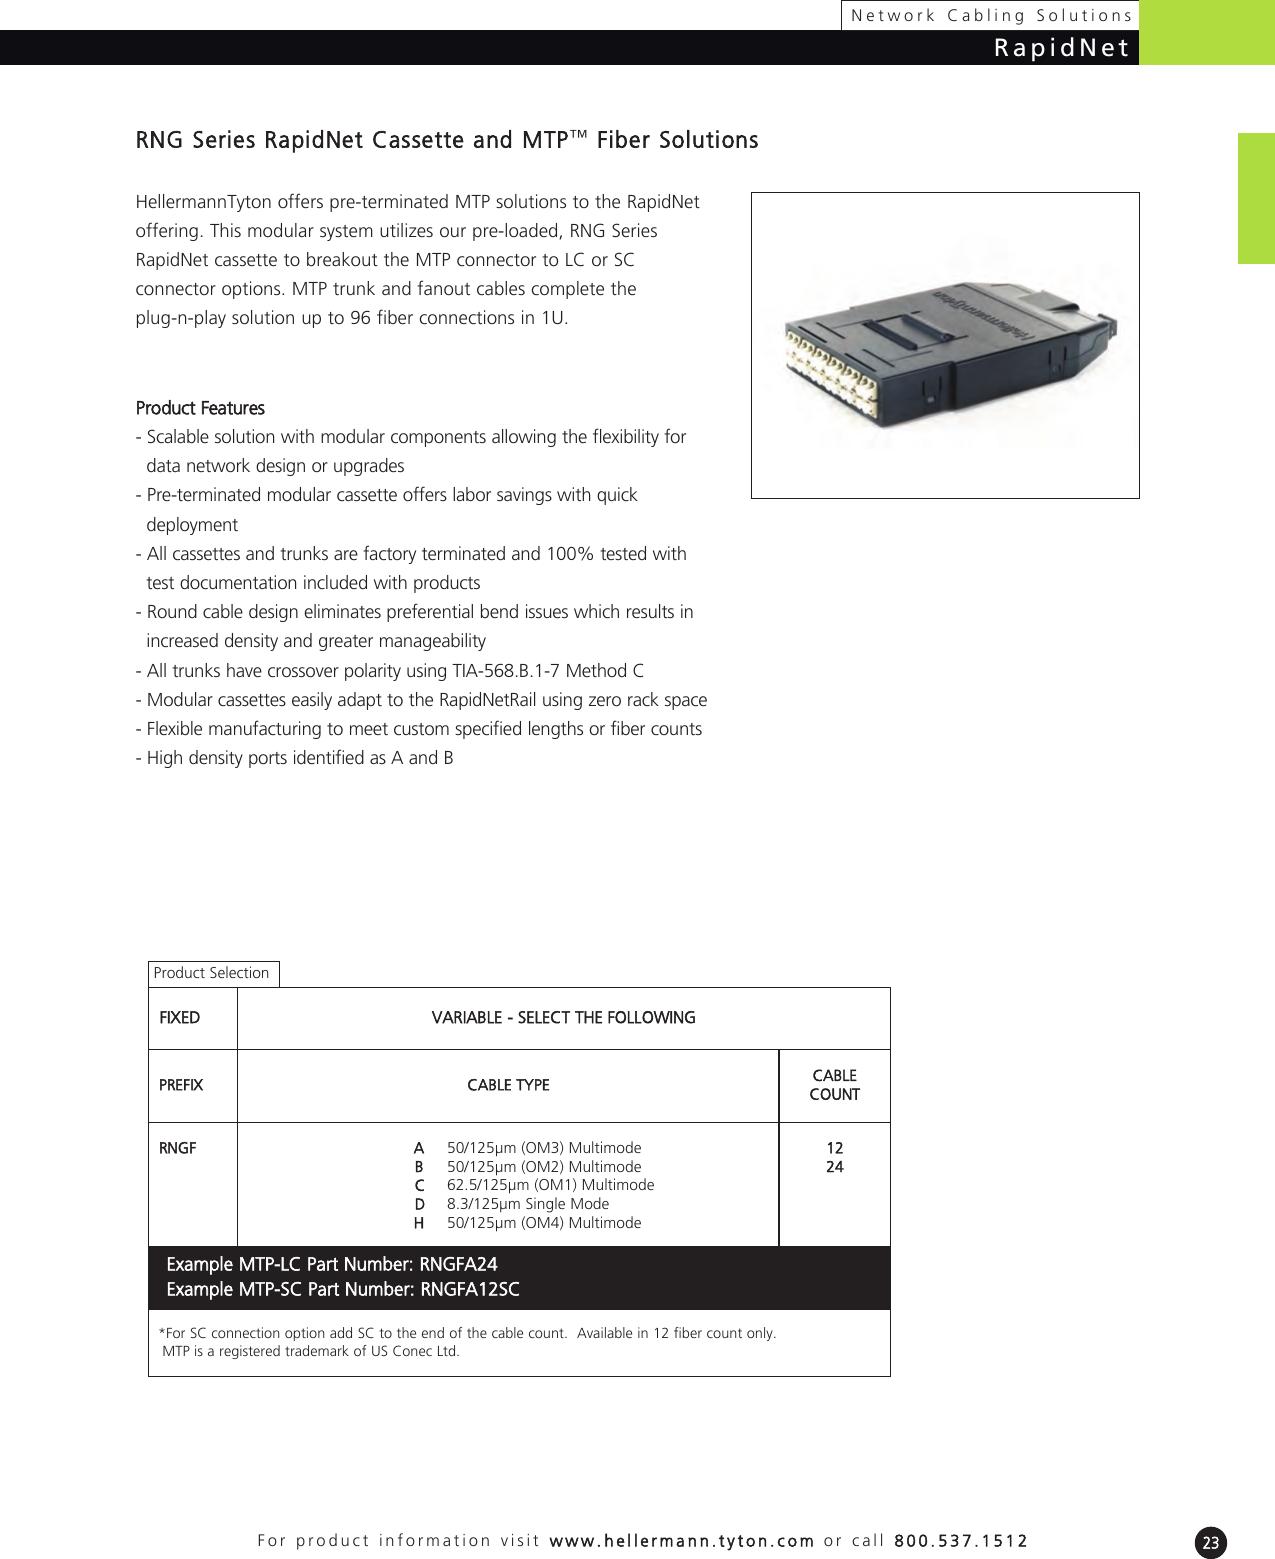 PCW5 CABLE MOD 8P8C PLUG-PLUG 5 Pack of 25